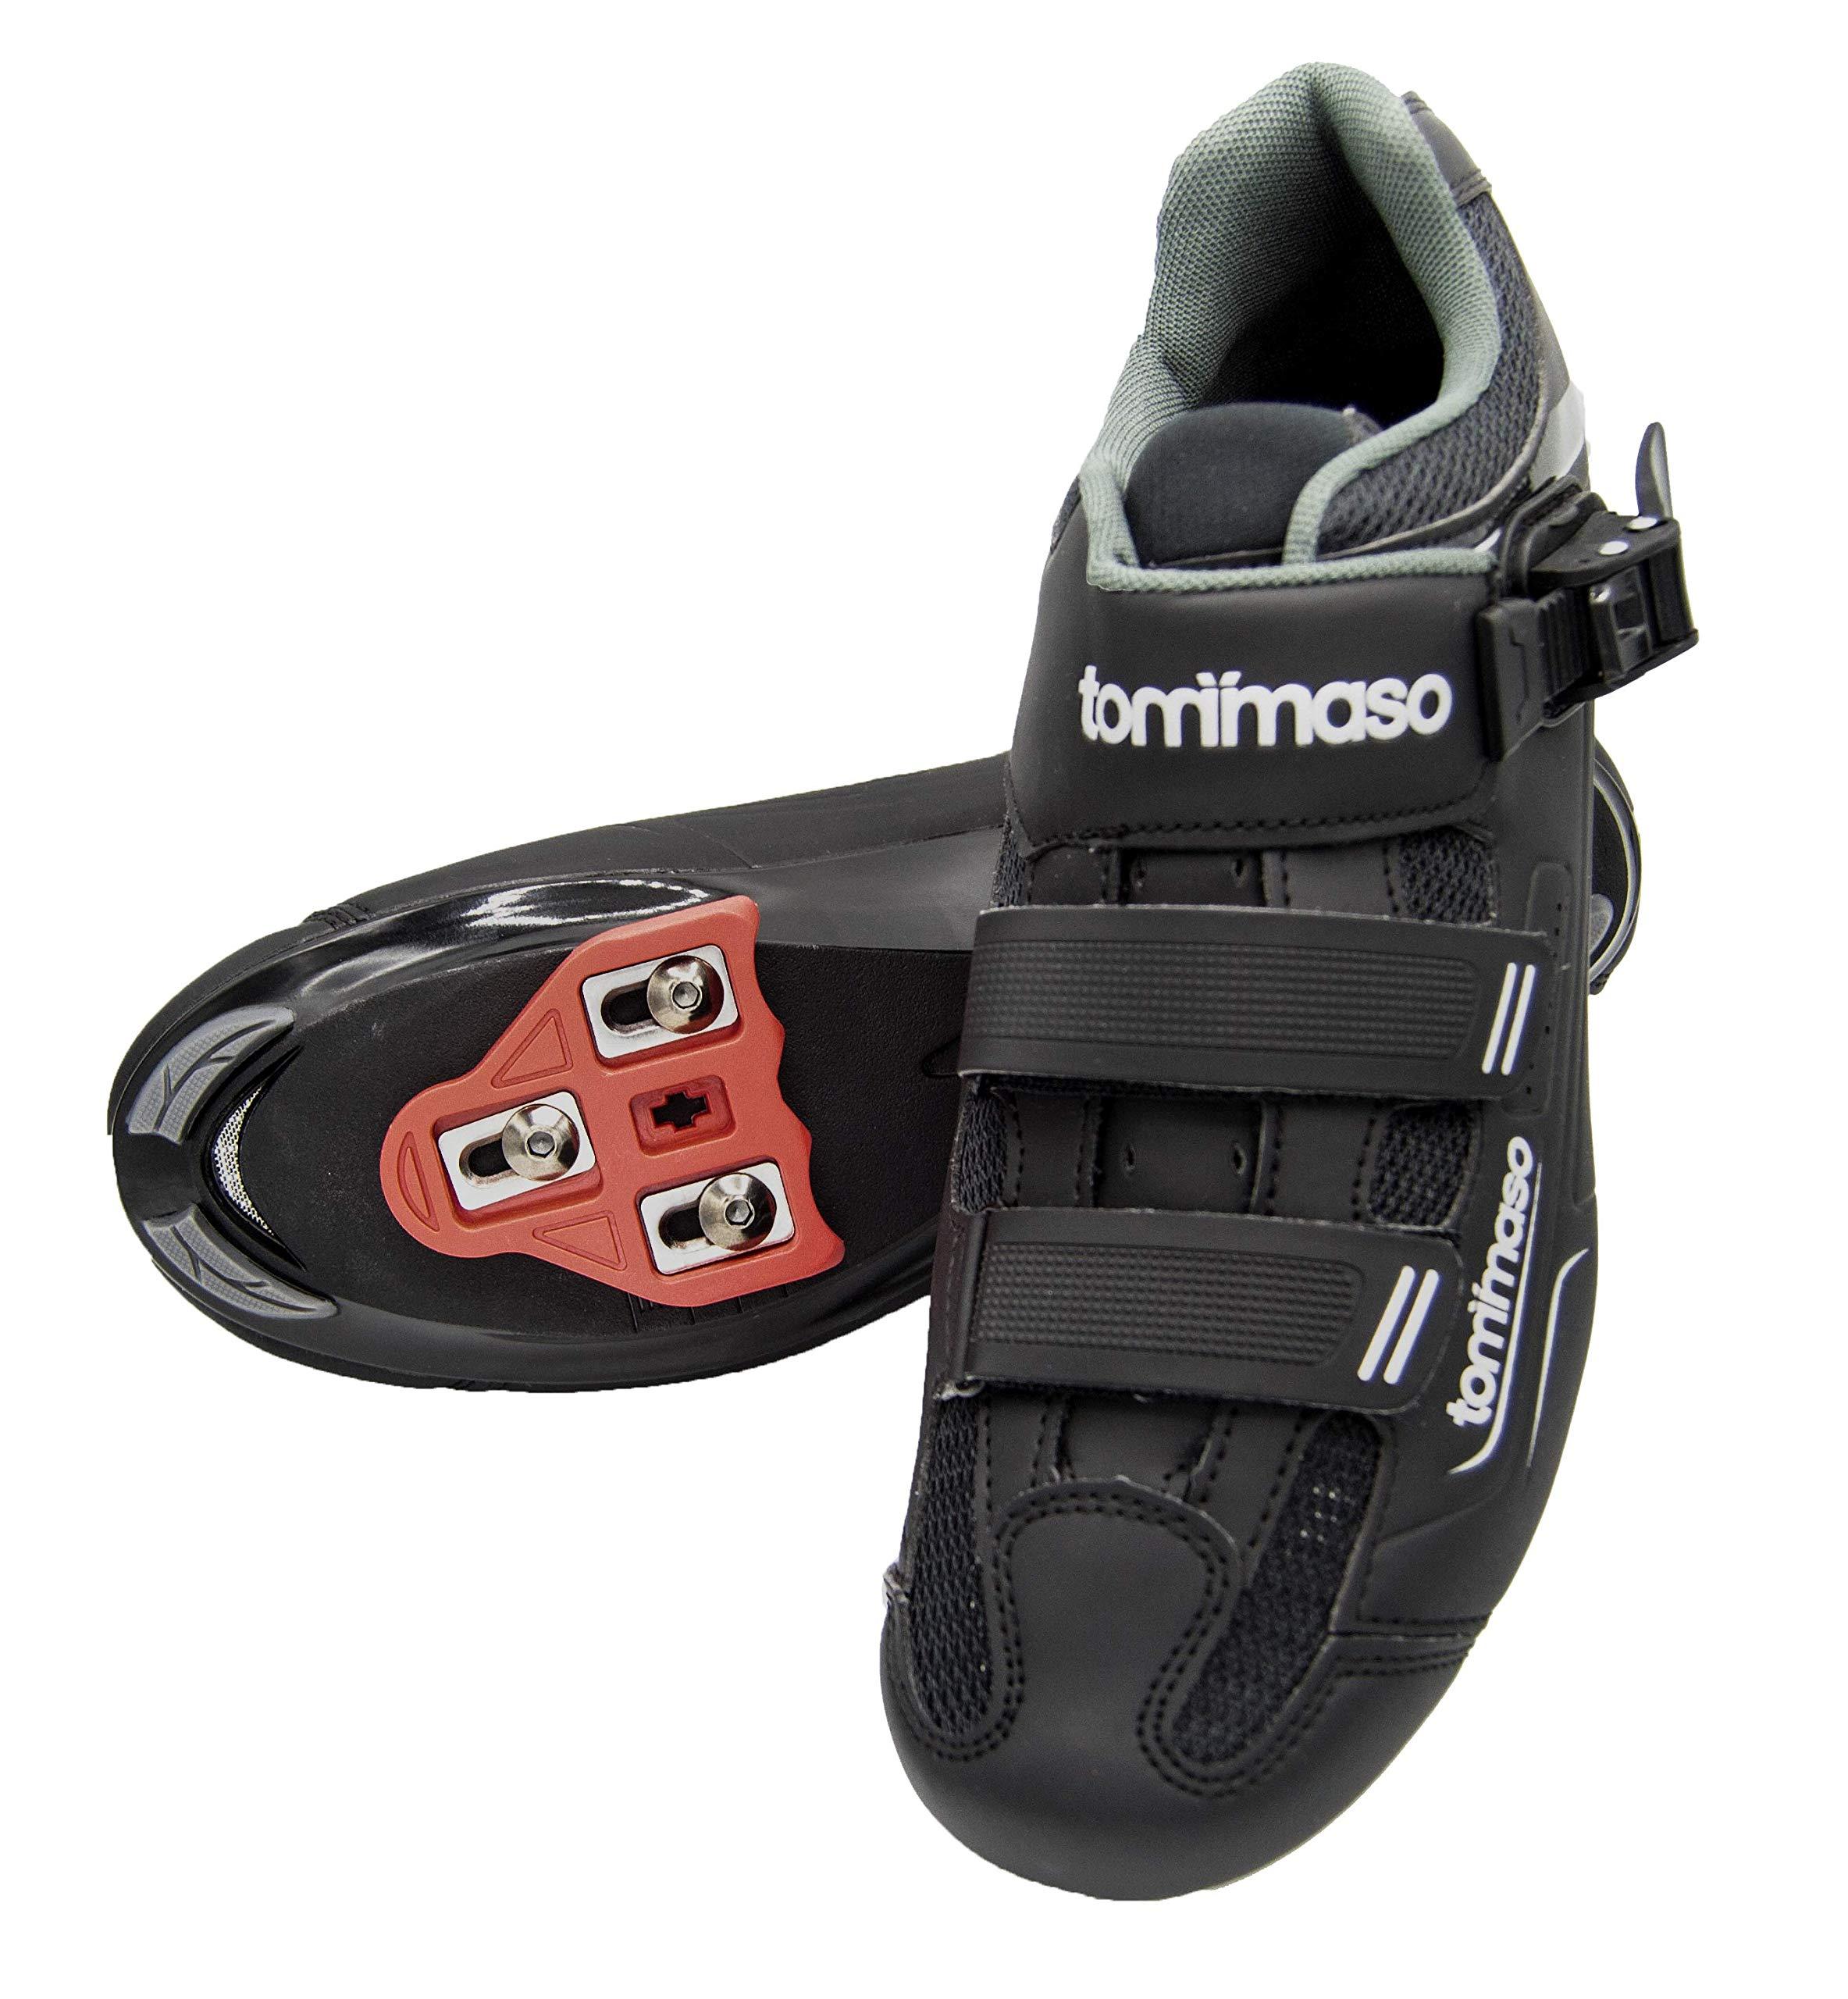 tommaso Strada 200 Dual Cleat Compatible Spin Class Ready Bike Shoe - Look Delta - 44 Black by tommaso